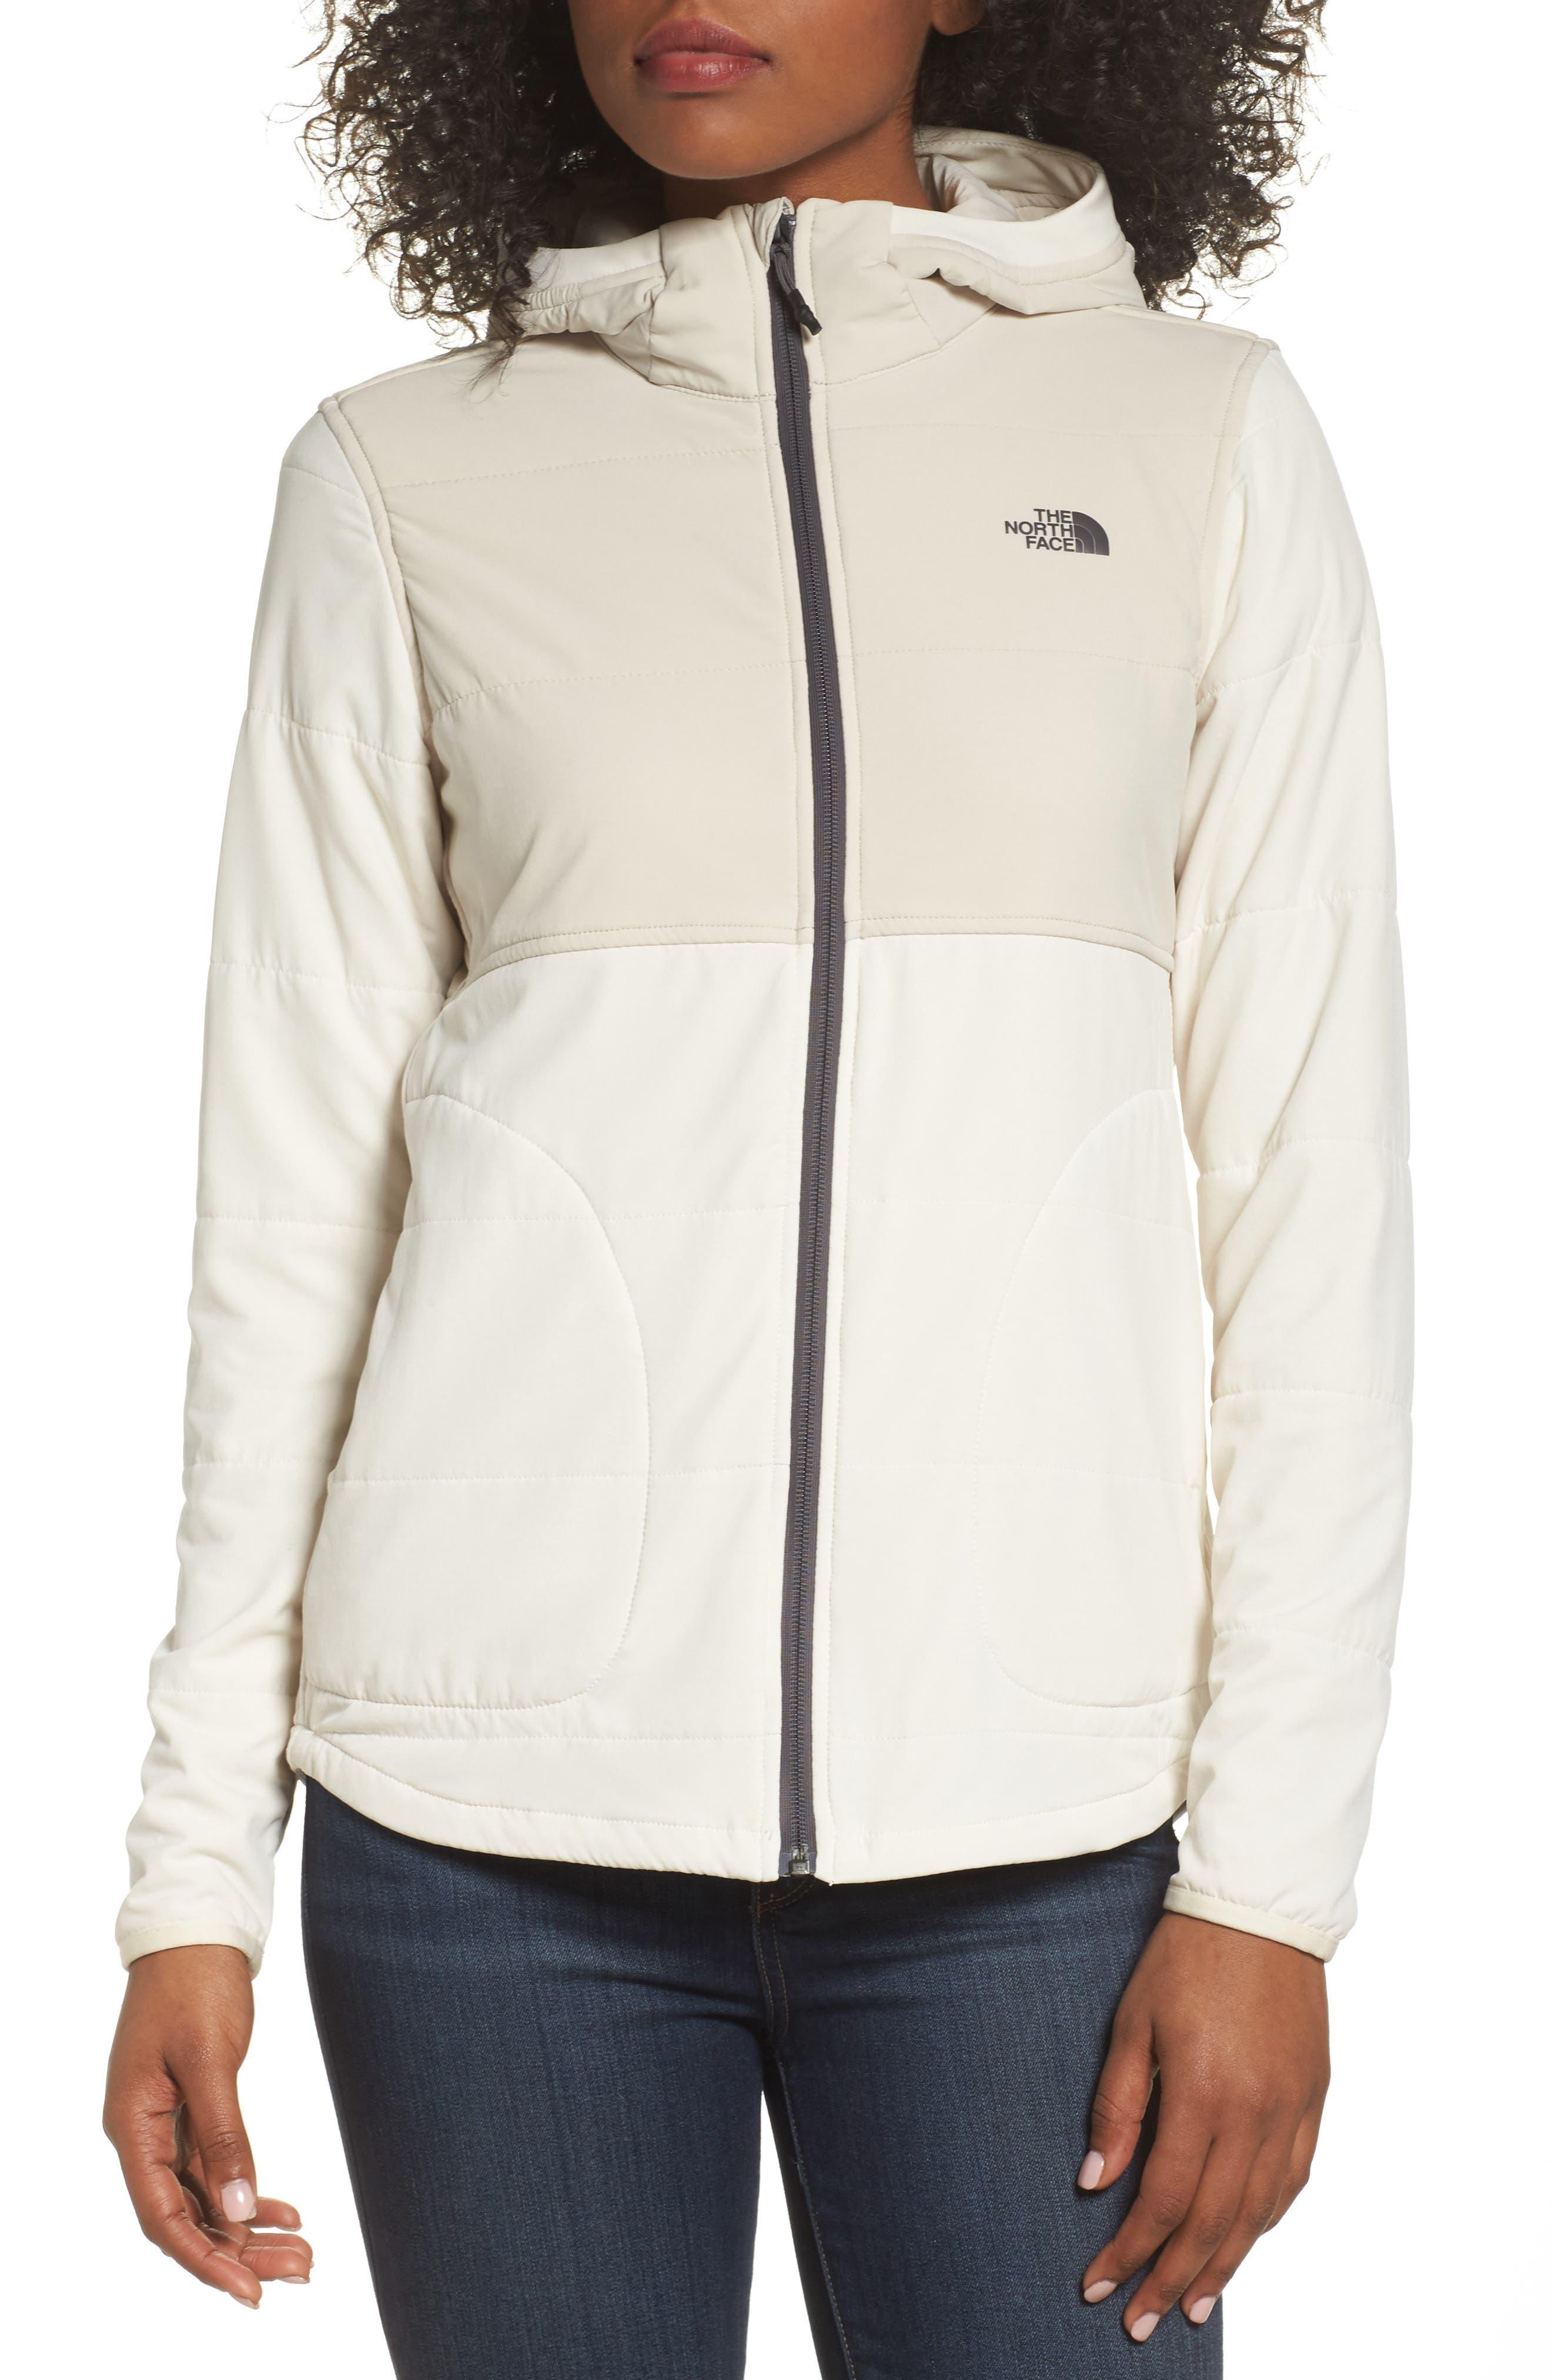 Mountain Sweatshirt Insulated Hooded Jacket,                             Alternate thumbnail 4, color,                             100